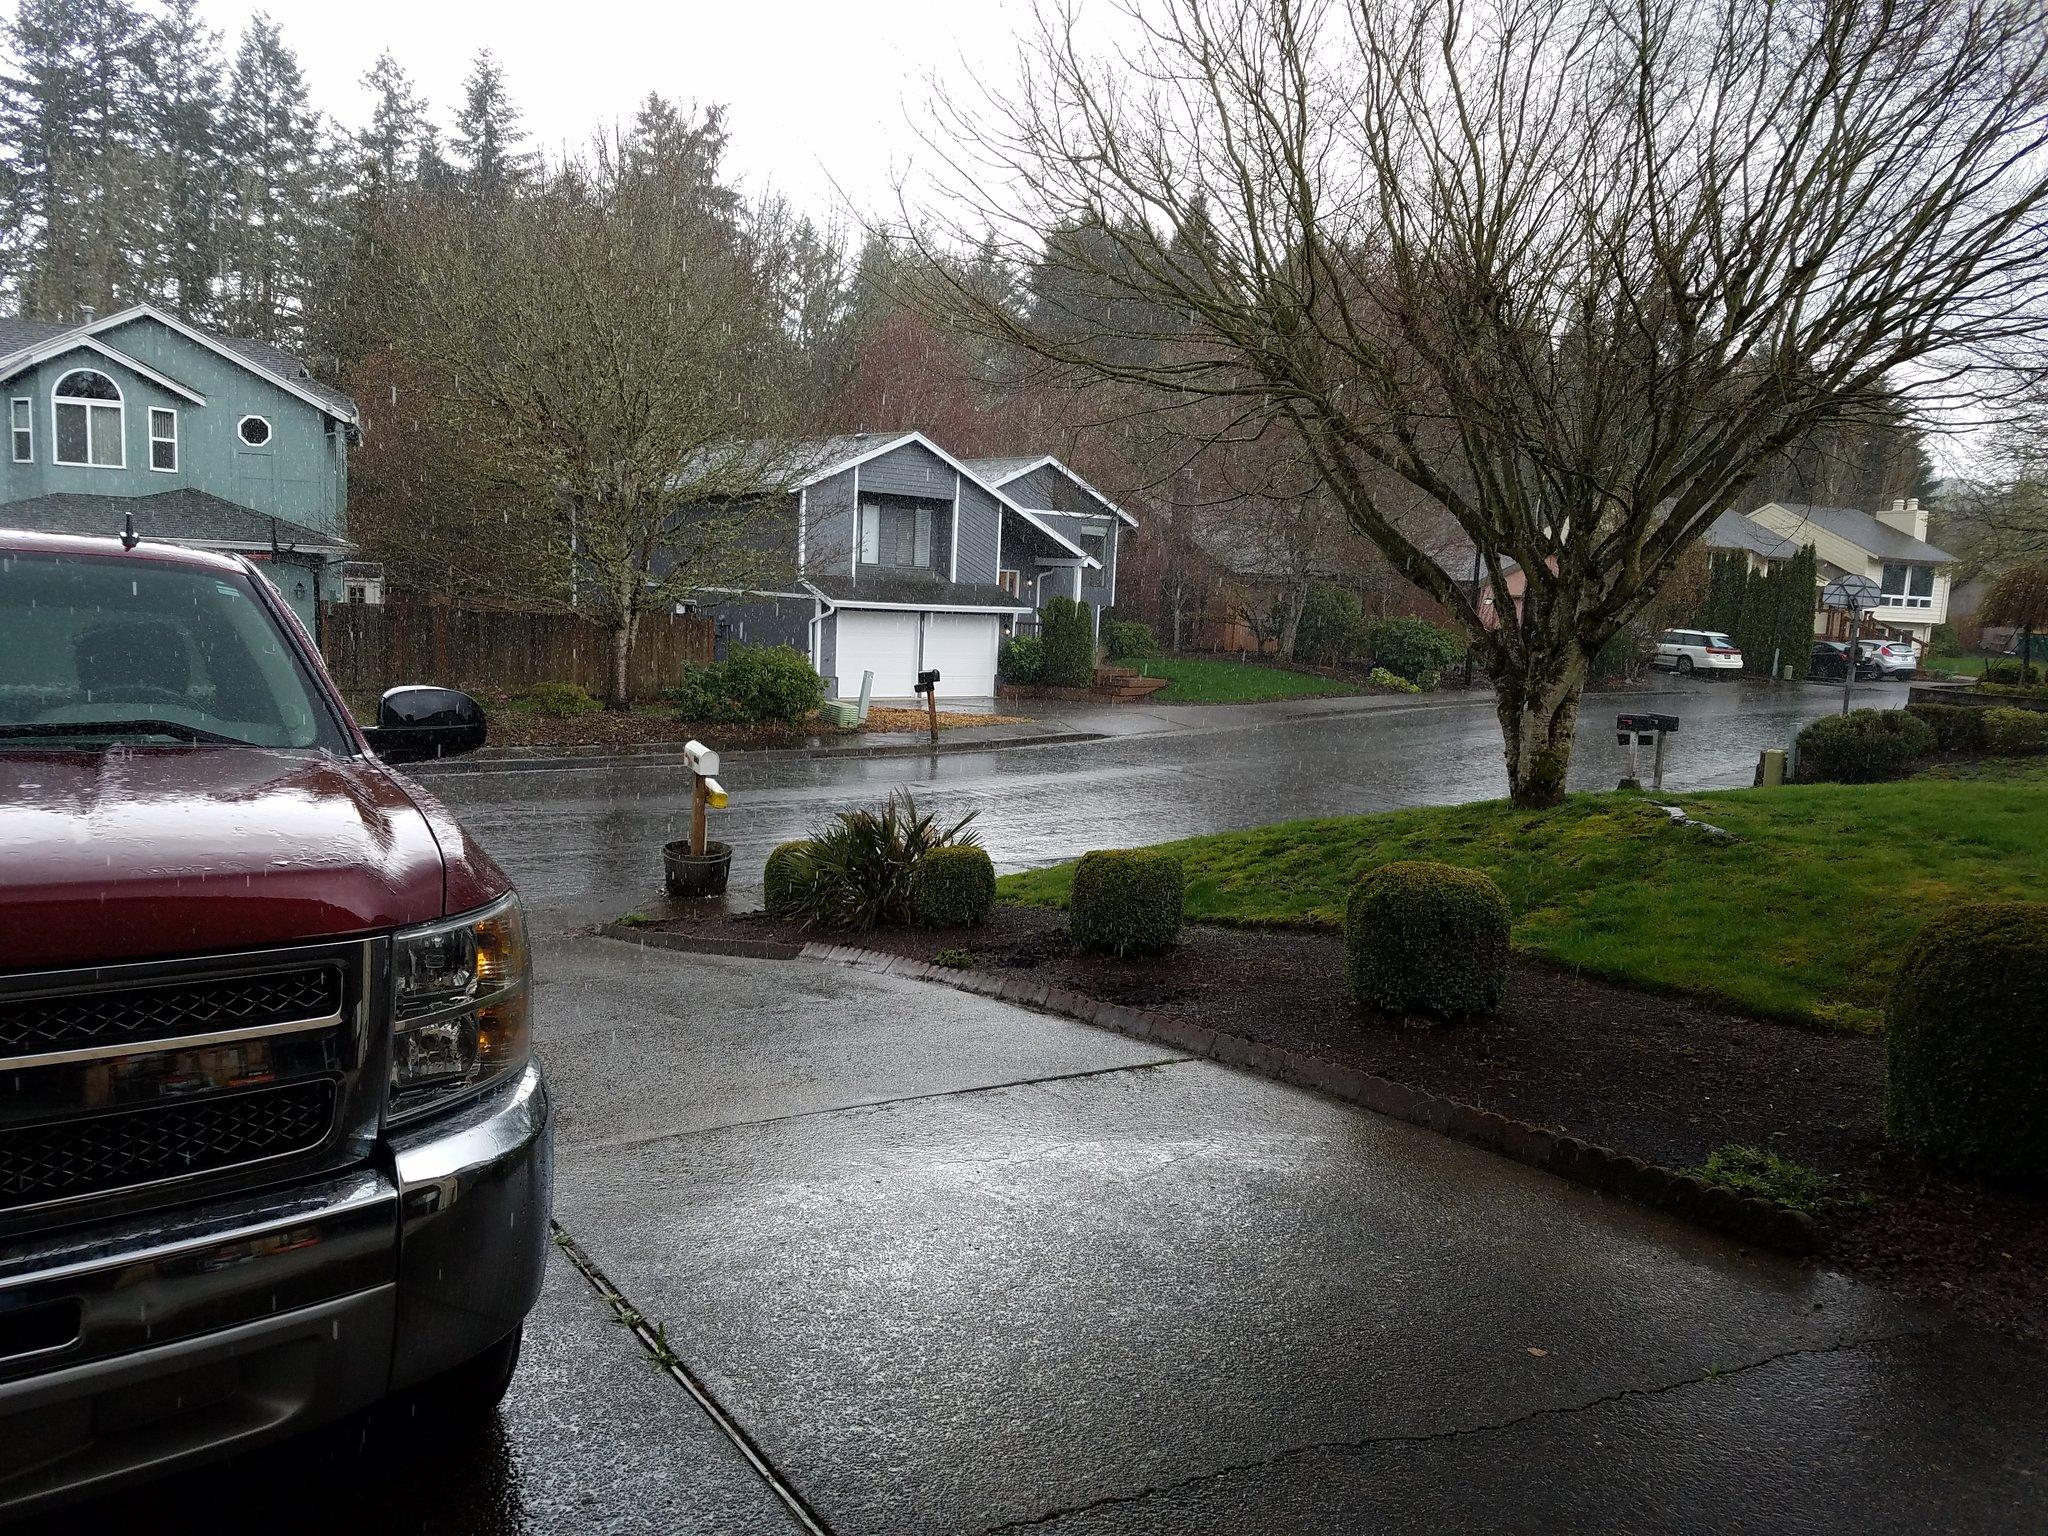 Howdy! Len here from Beaverton, Oregon, where it's our spring break! #txlchat https://t.co/cKItemHOrp